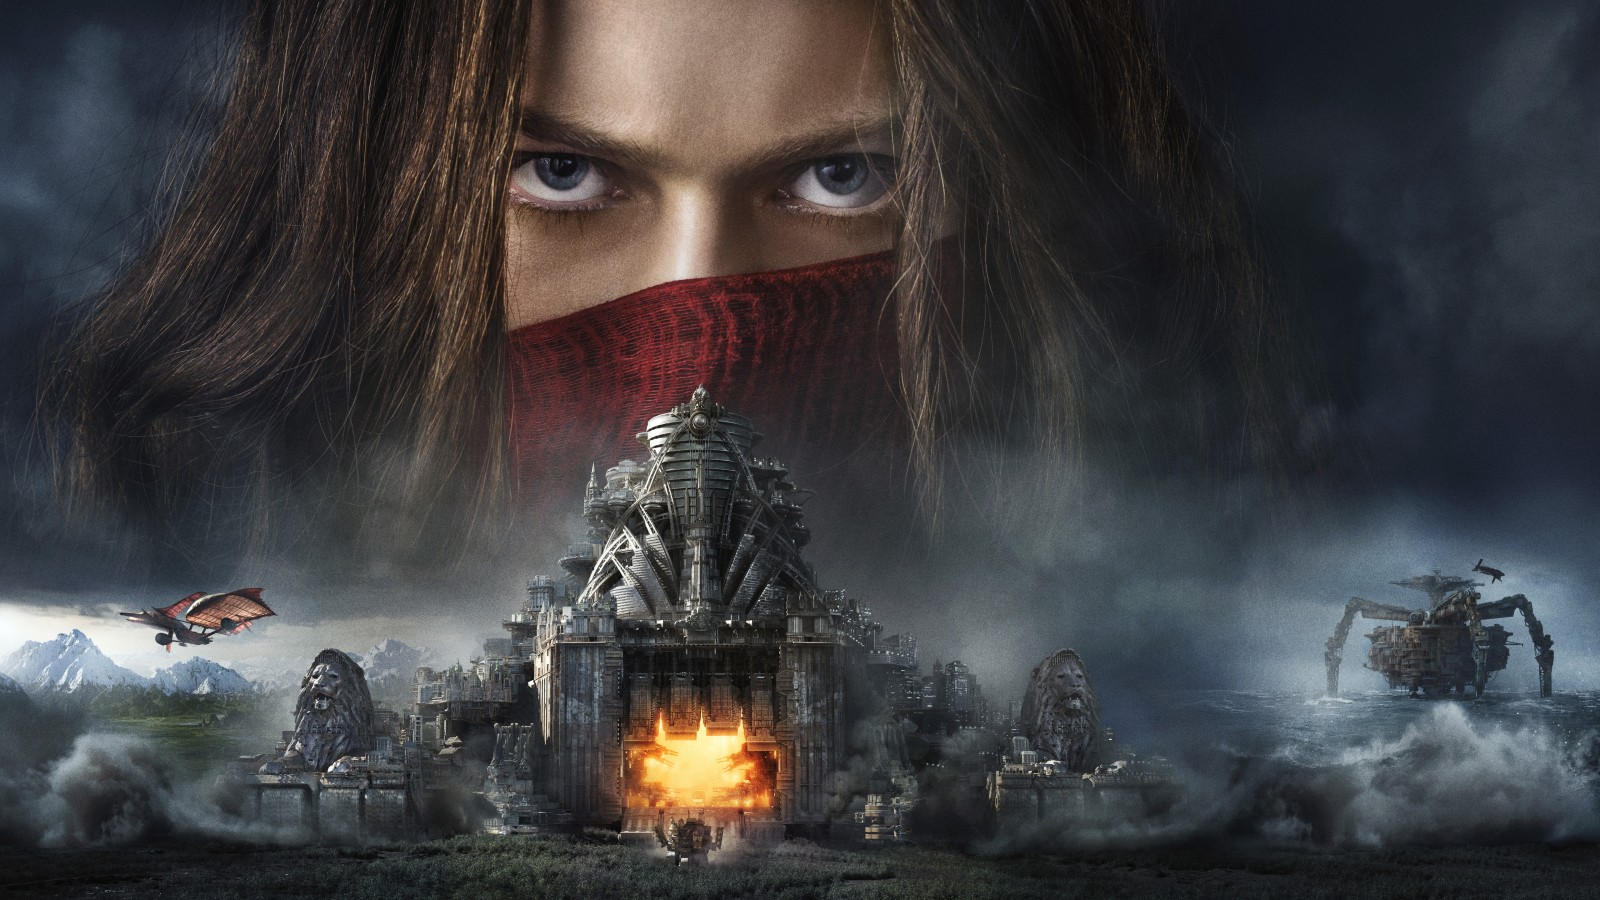 Nature Hd Wallpaper Widescreen 3d Mortal Engines 2018 Movie 5k Wallpapers Hd Wallpapers